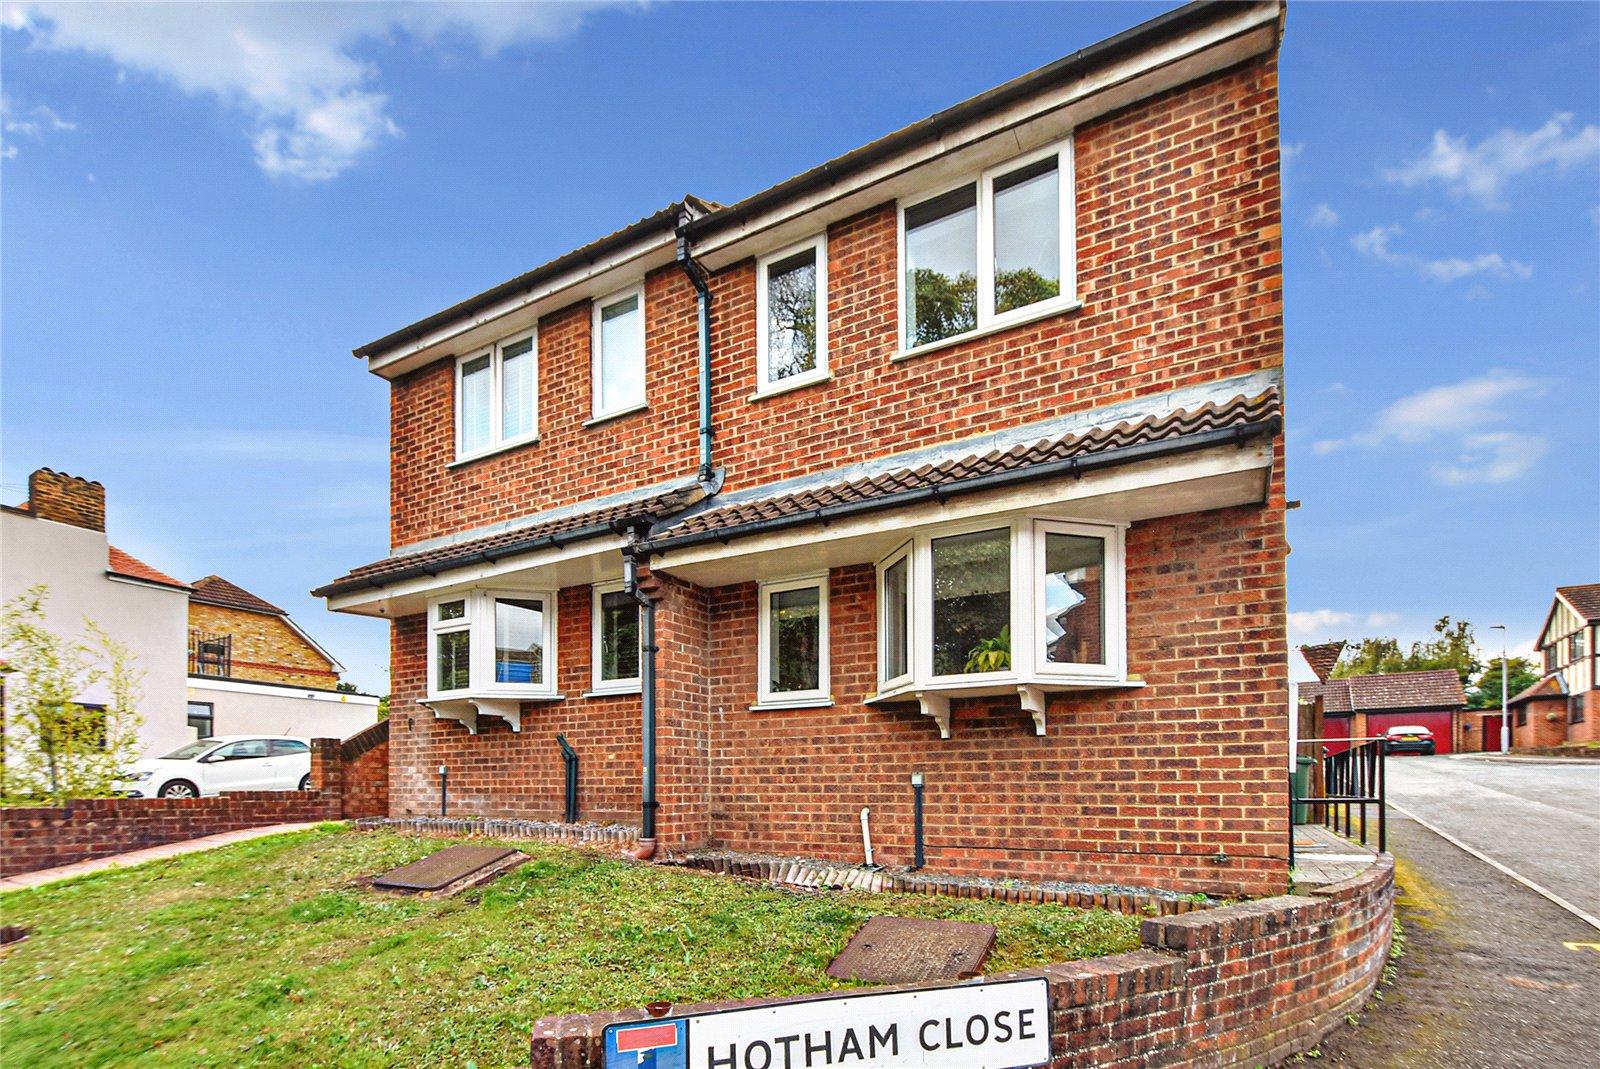 Hotham Close, Sutton At Hone, Dartford, Kent, DA4